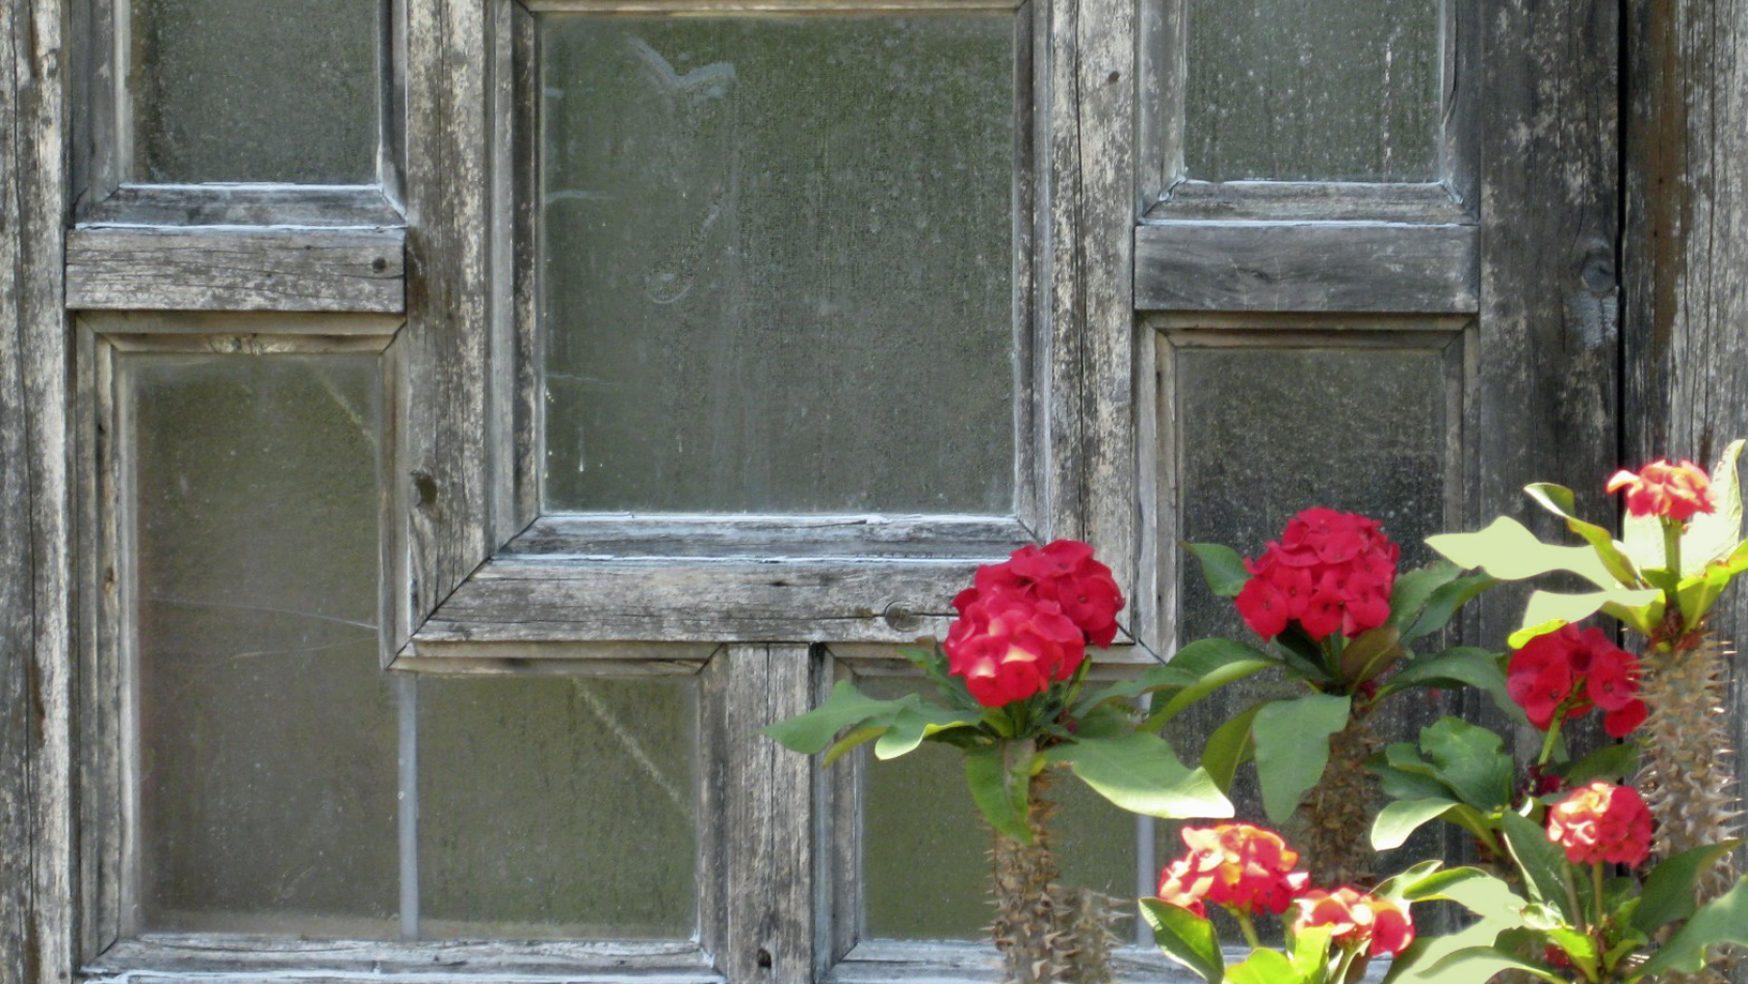 The New Johari Window #28: Quadrant Three: Interpersonal Needs